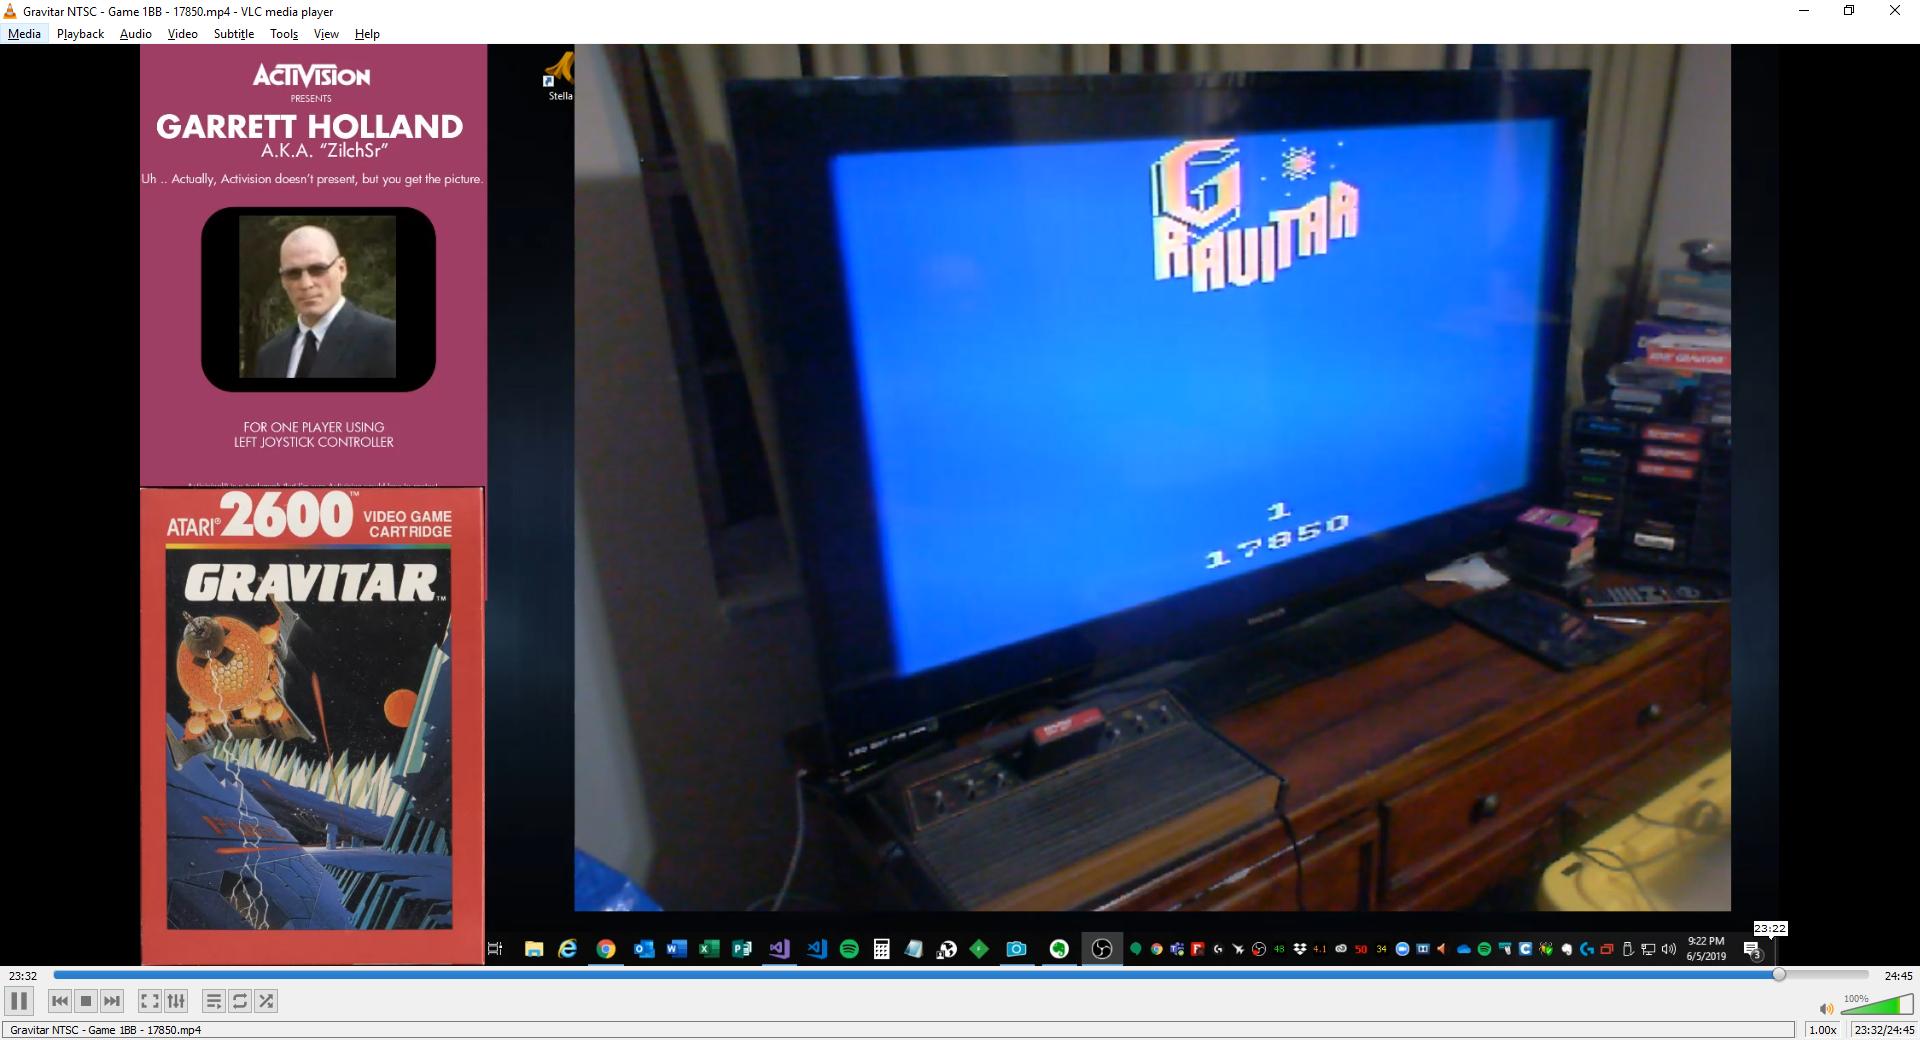 ZilchSr: Gravitar (Atari 2600 Novice/B) 17,850 points on 2019-06-05 21:34:32